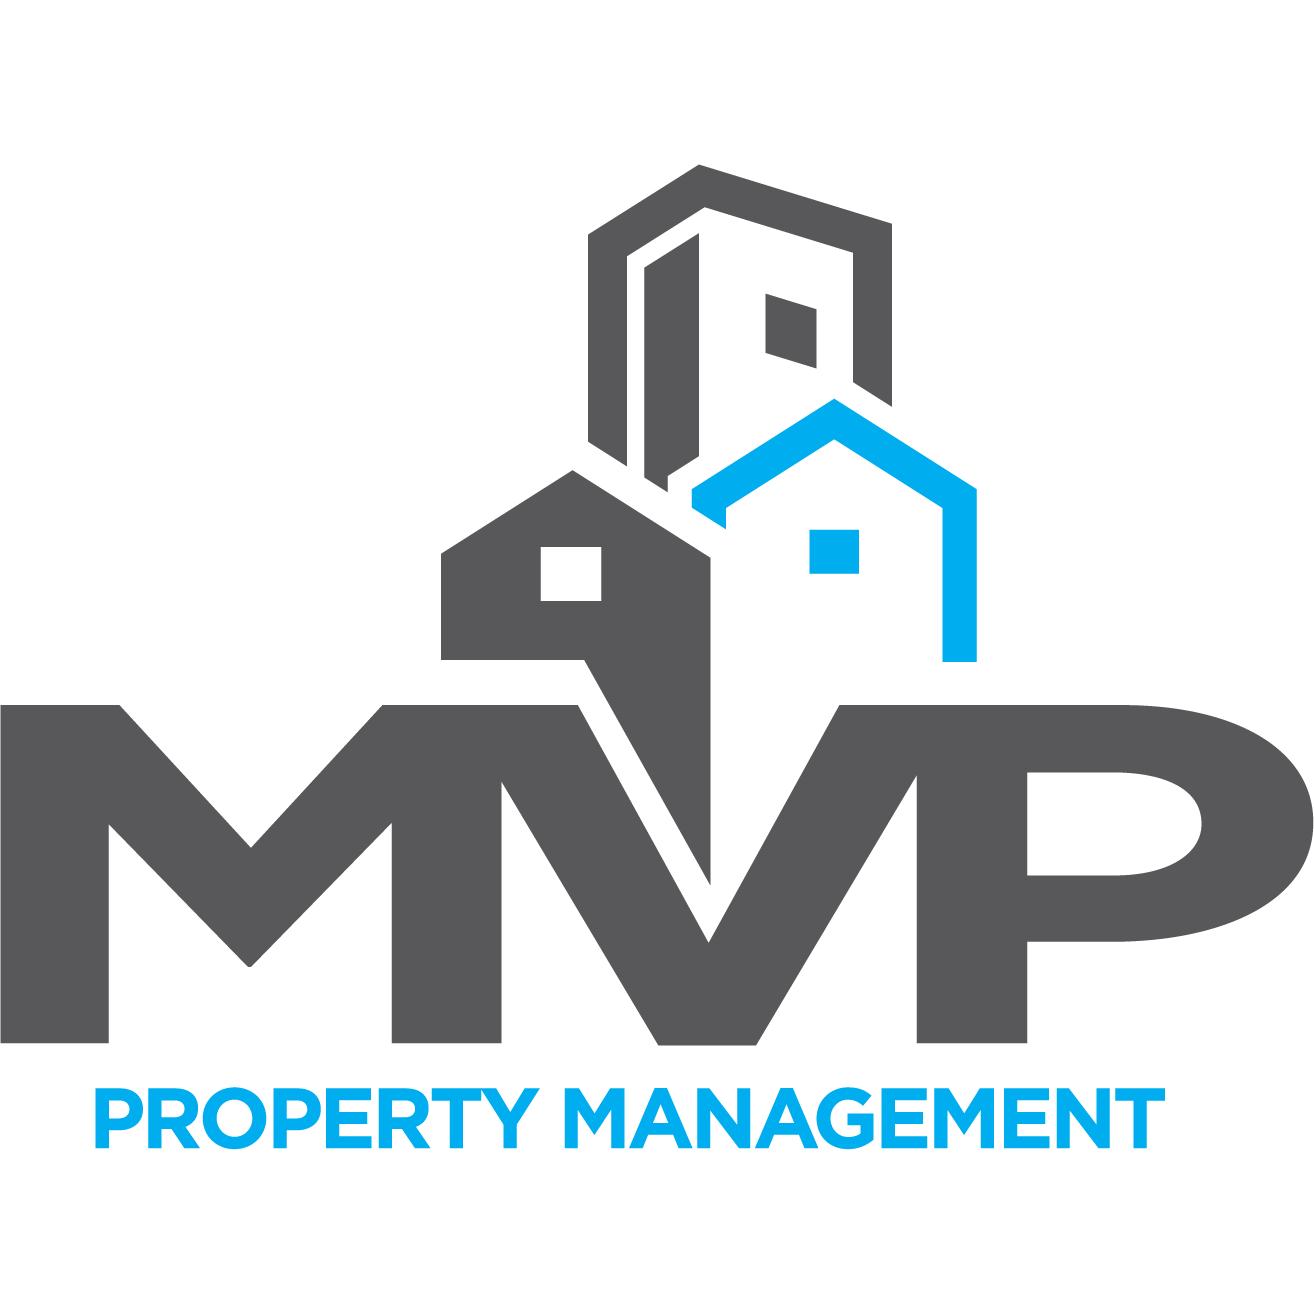 My MVP Property Management